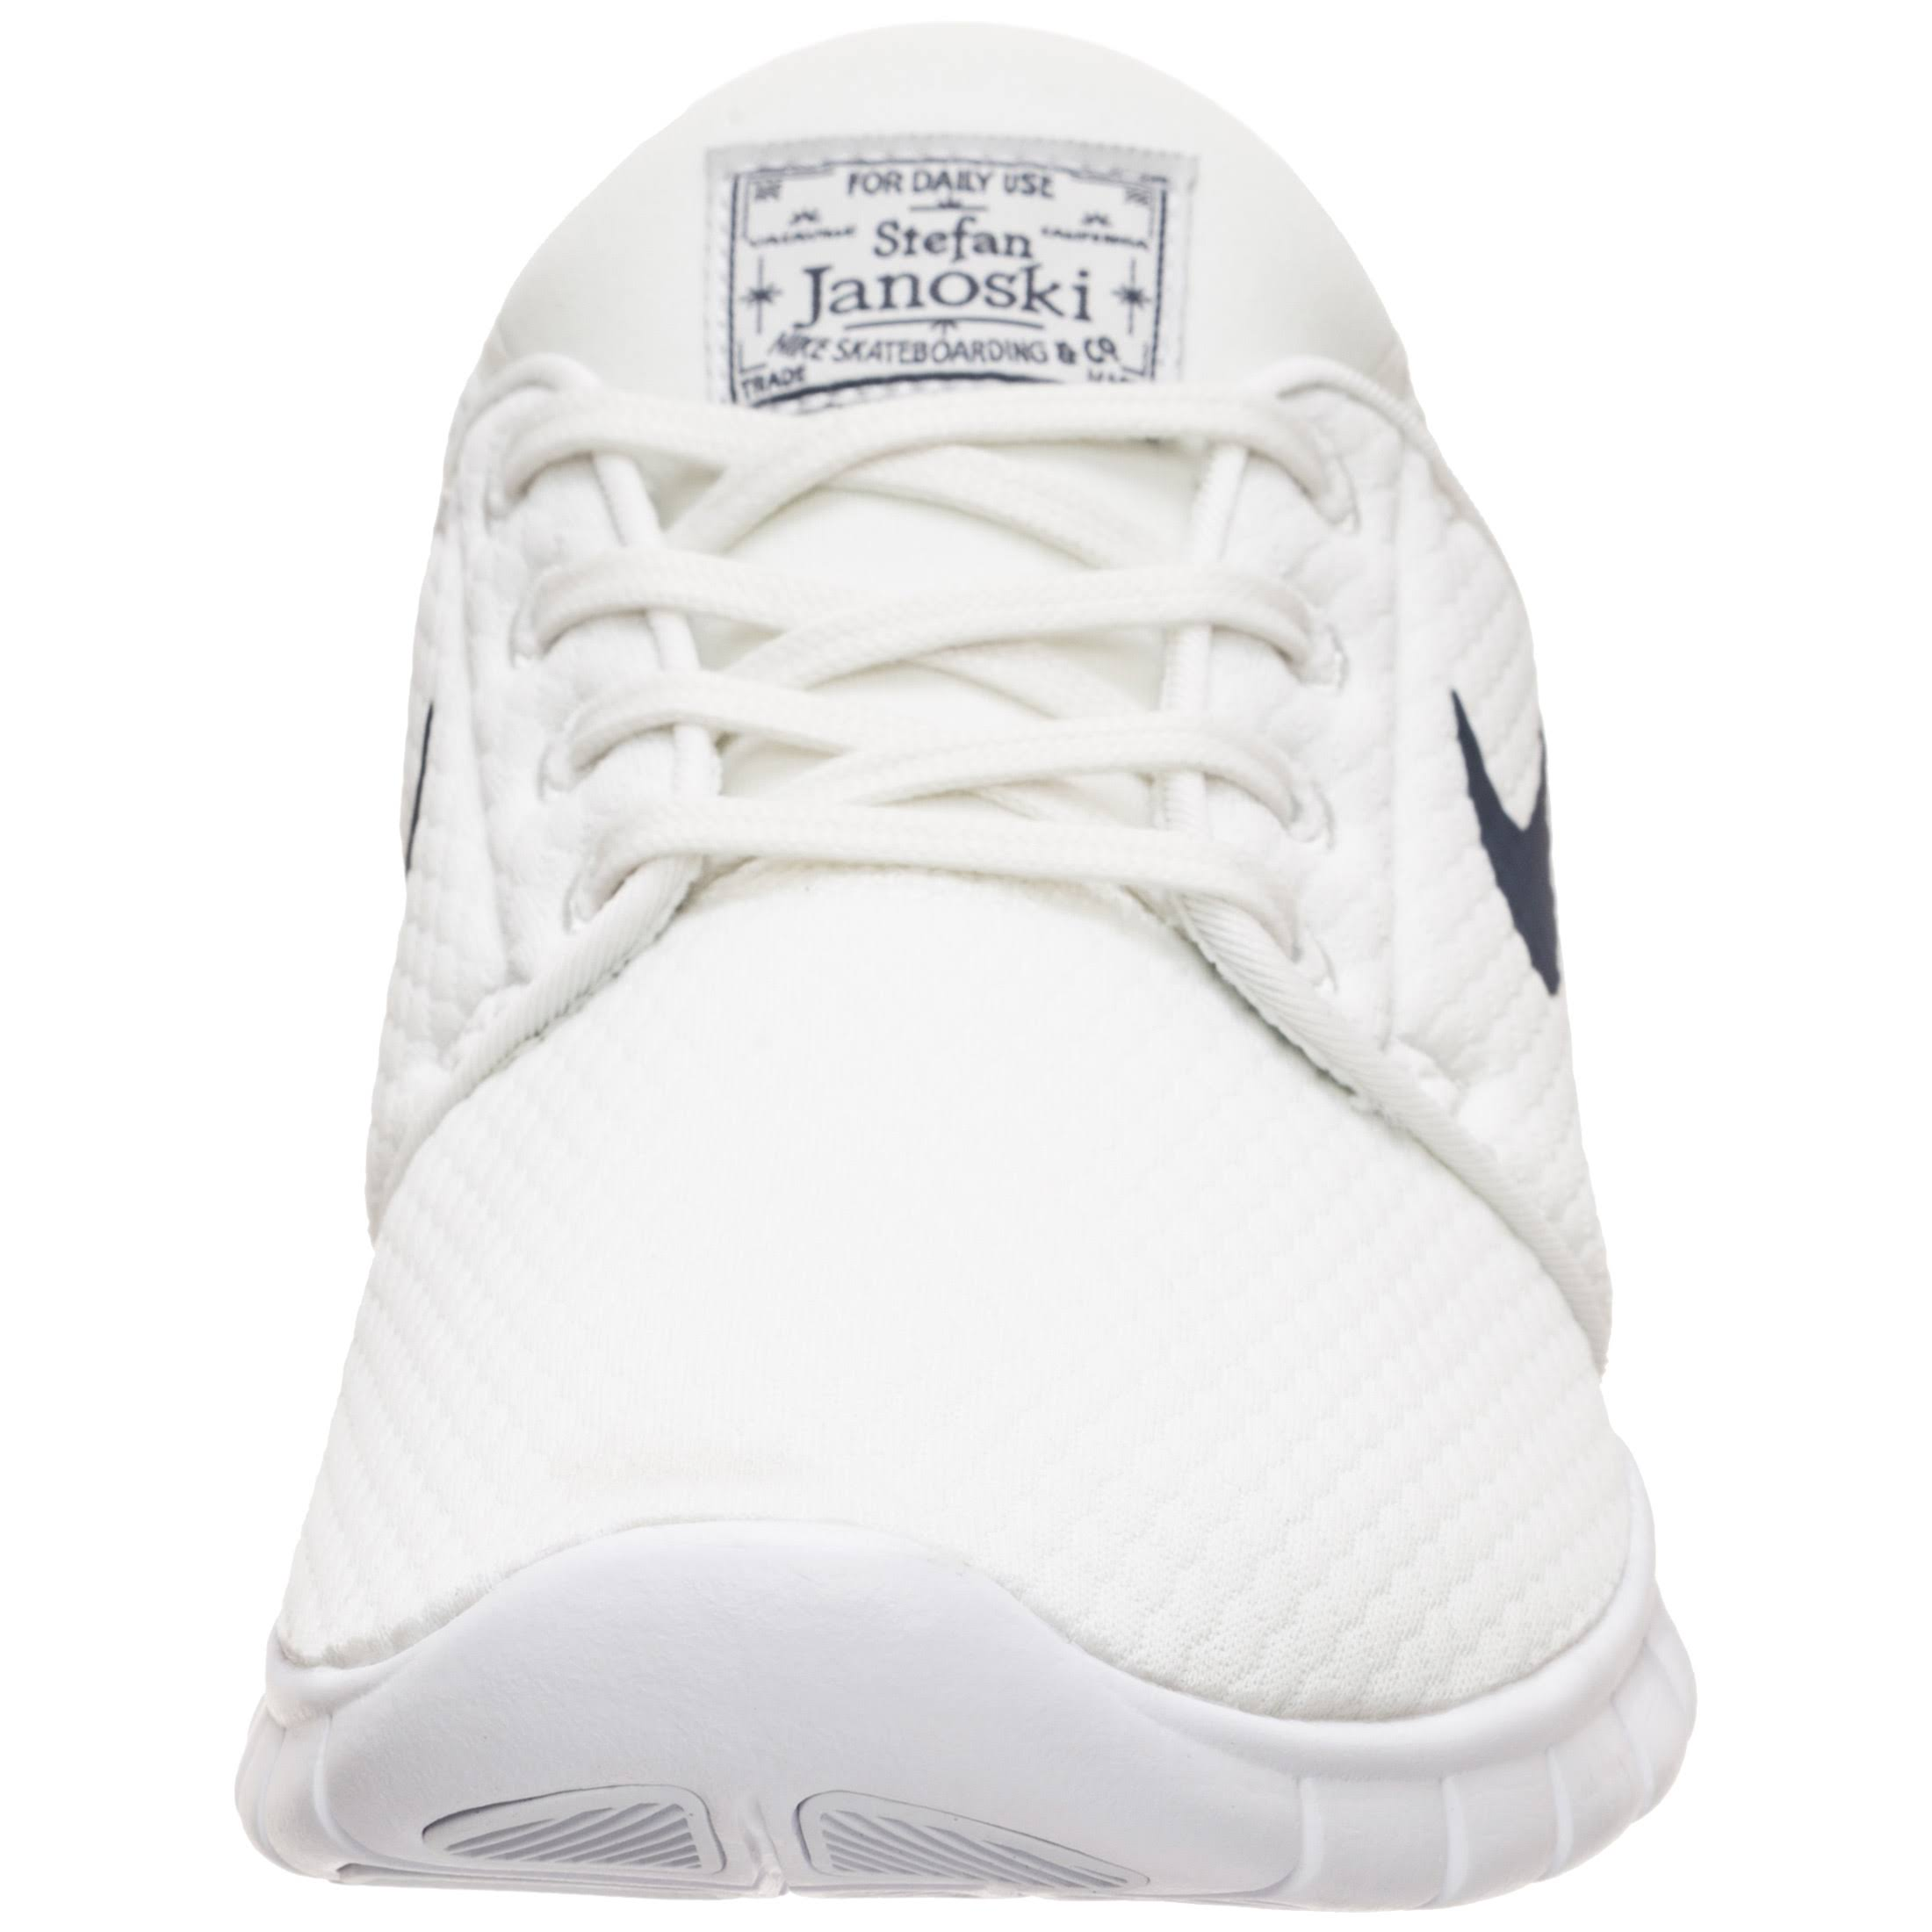 Sb Weiß Nike Max Janoski Sneaker Schwarz blau Air Weiß Stefan AwAx5F1H